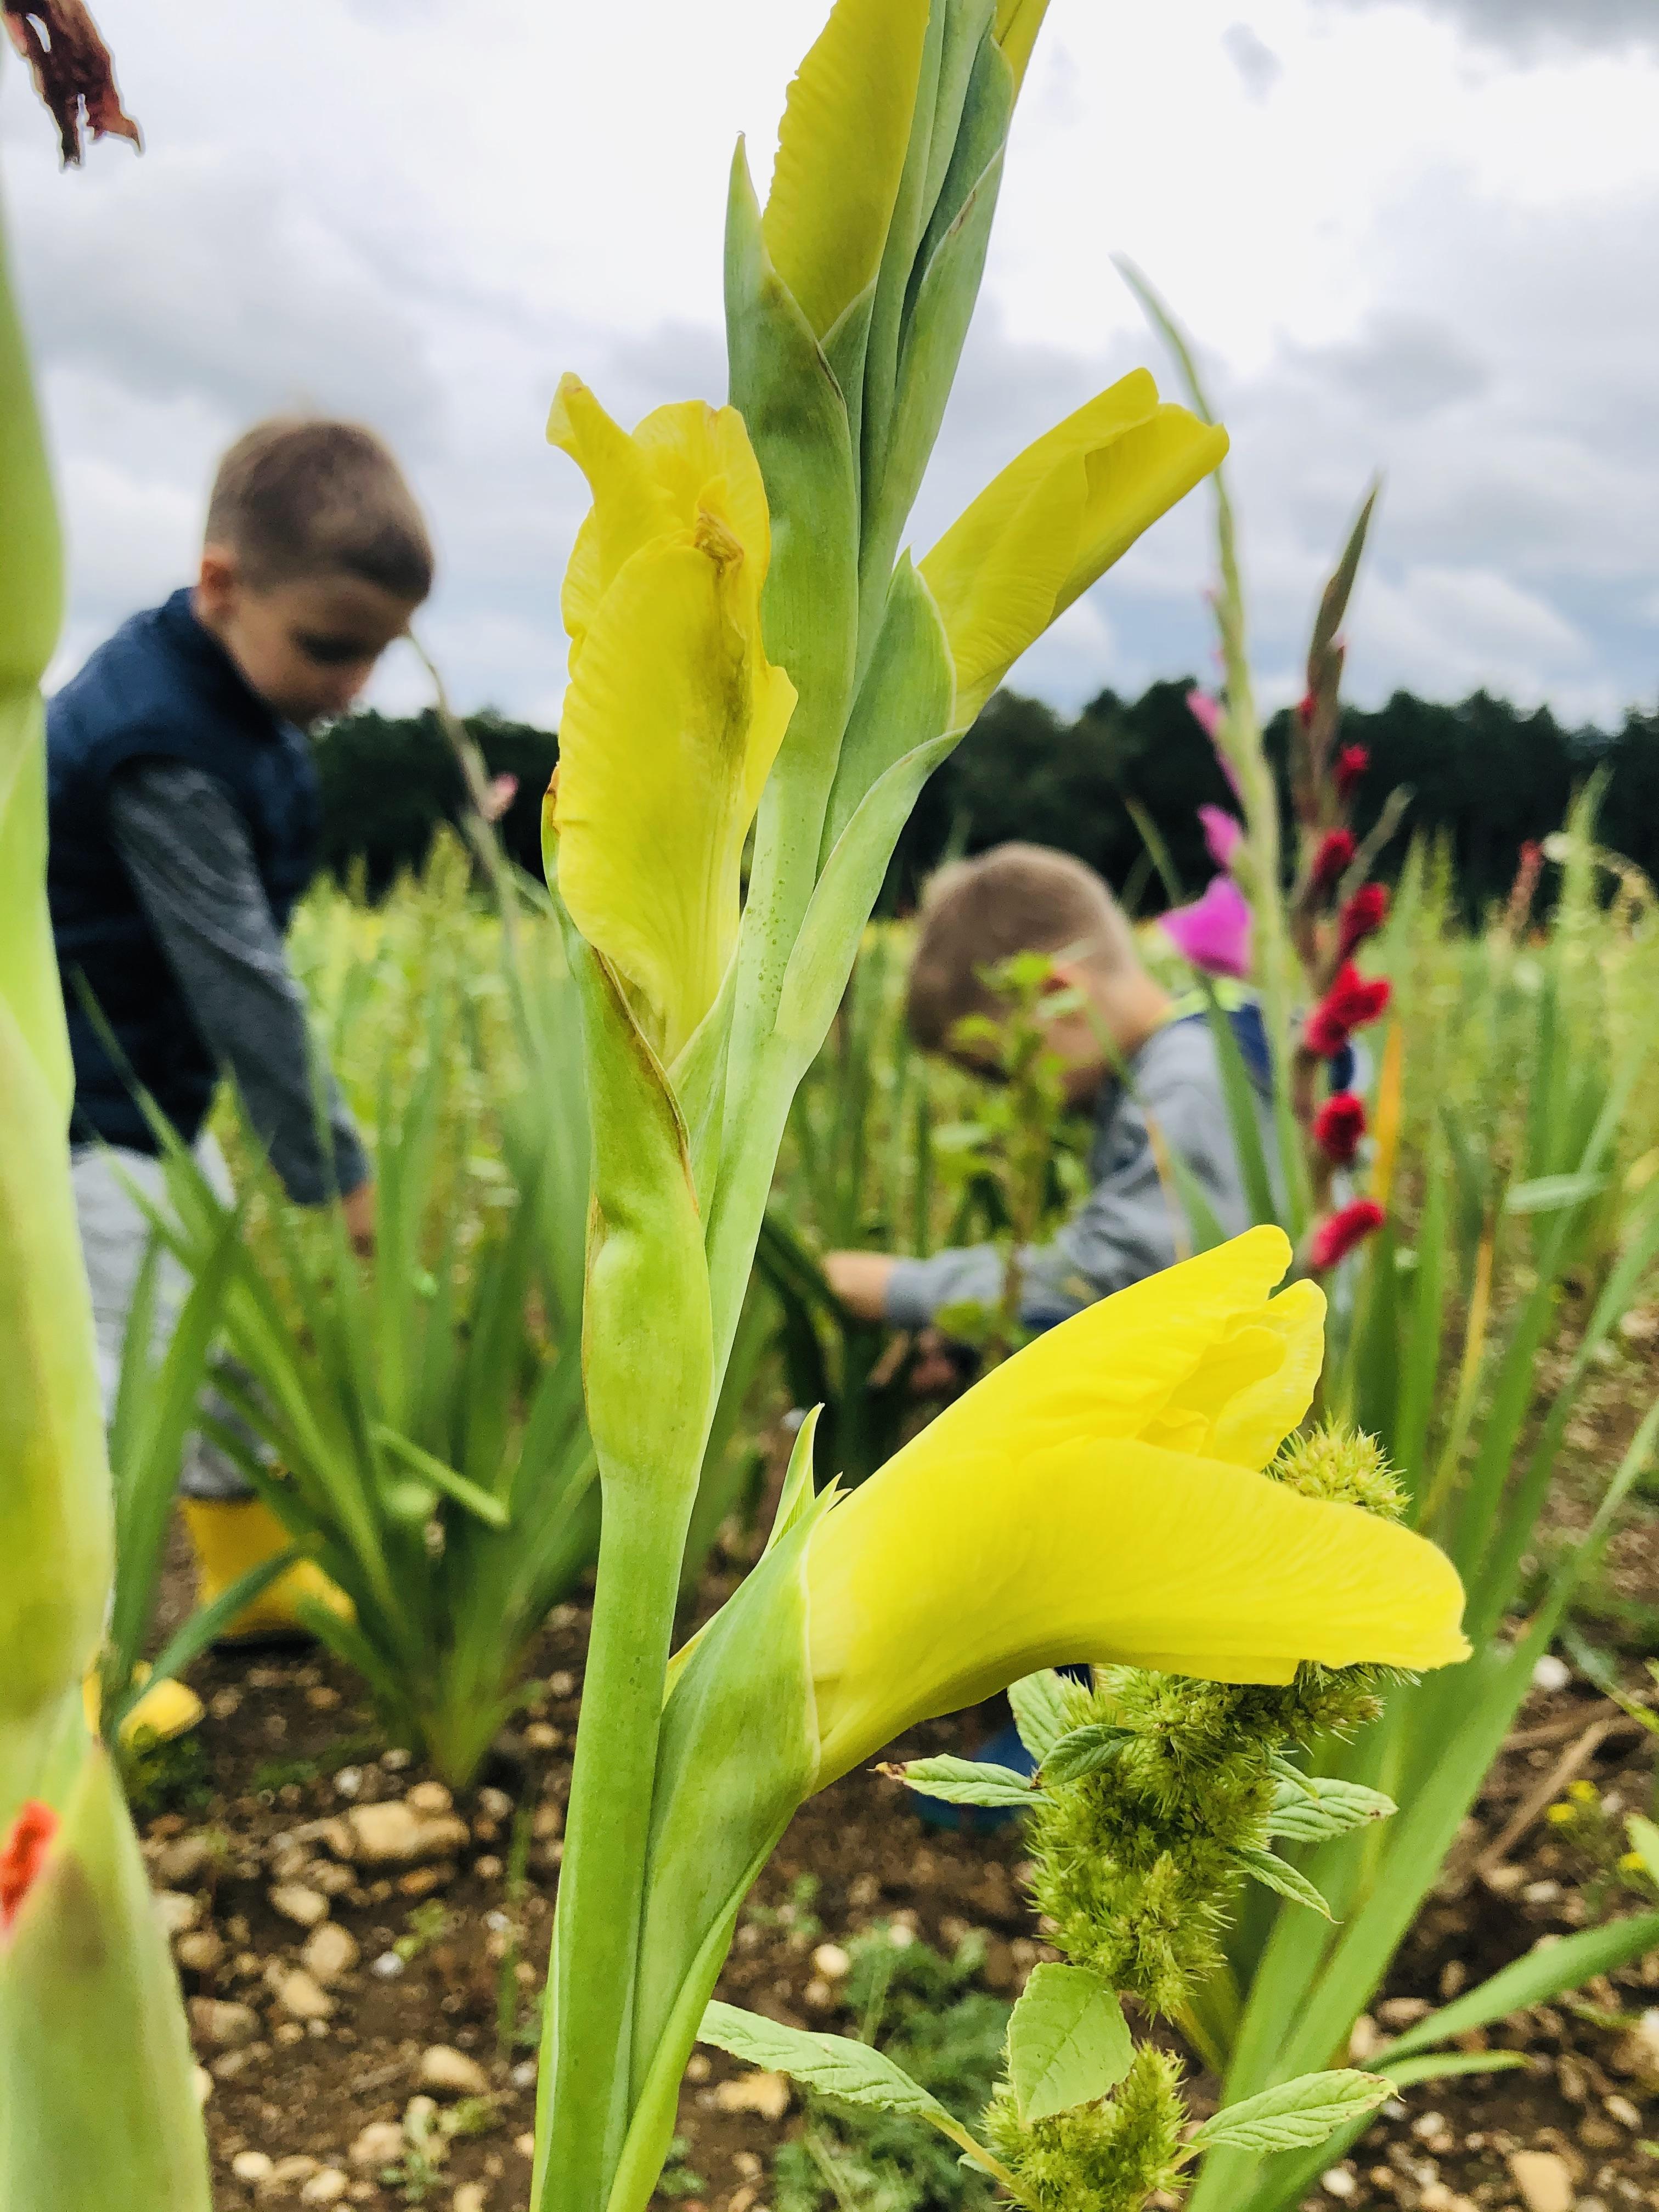 harvesting flowers in the field